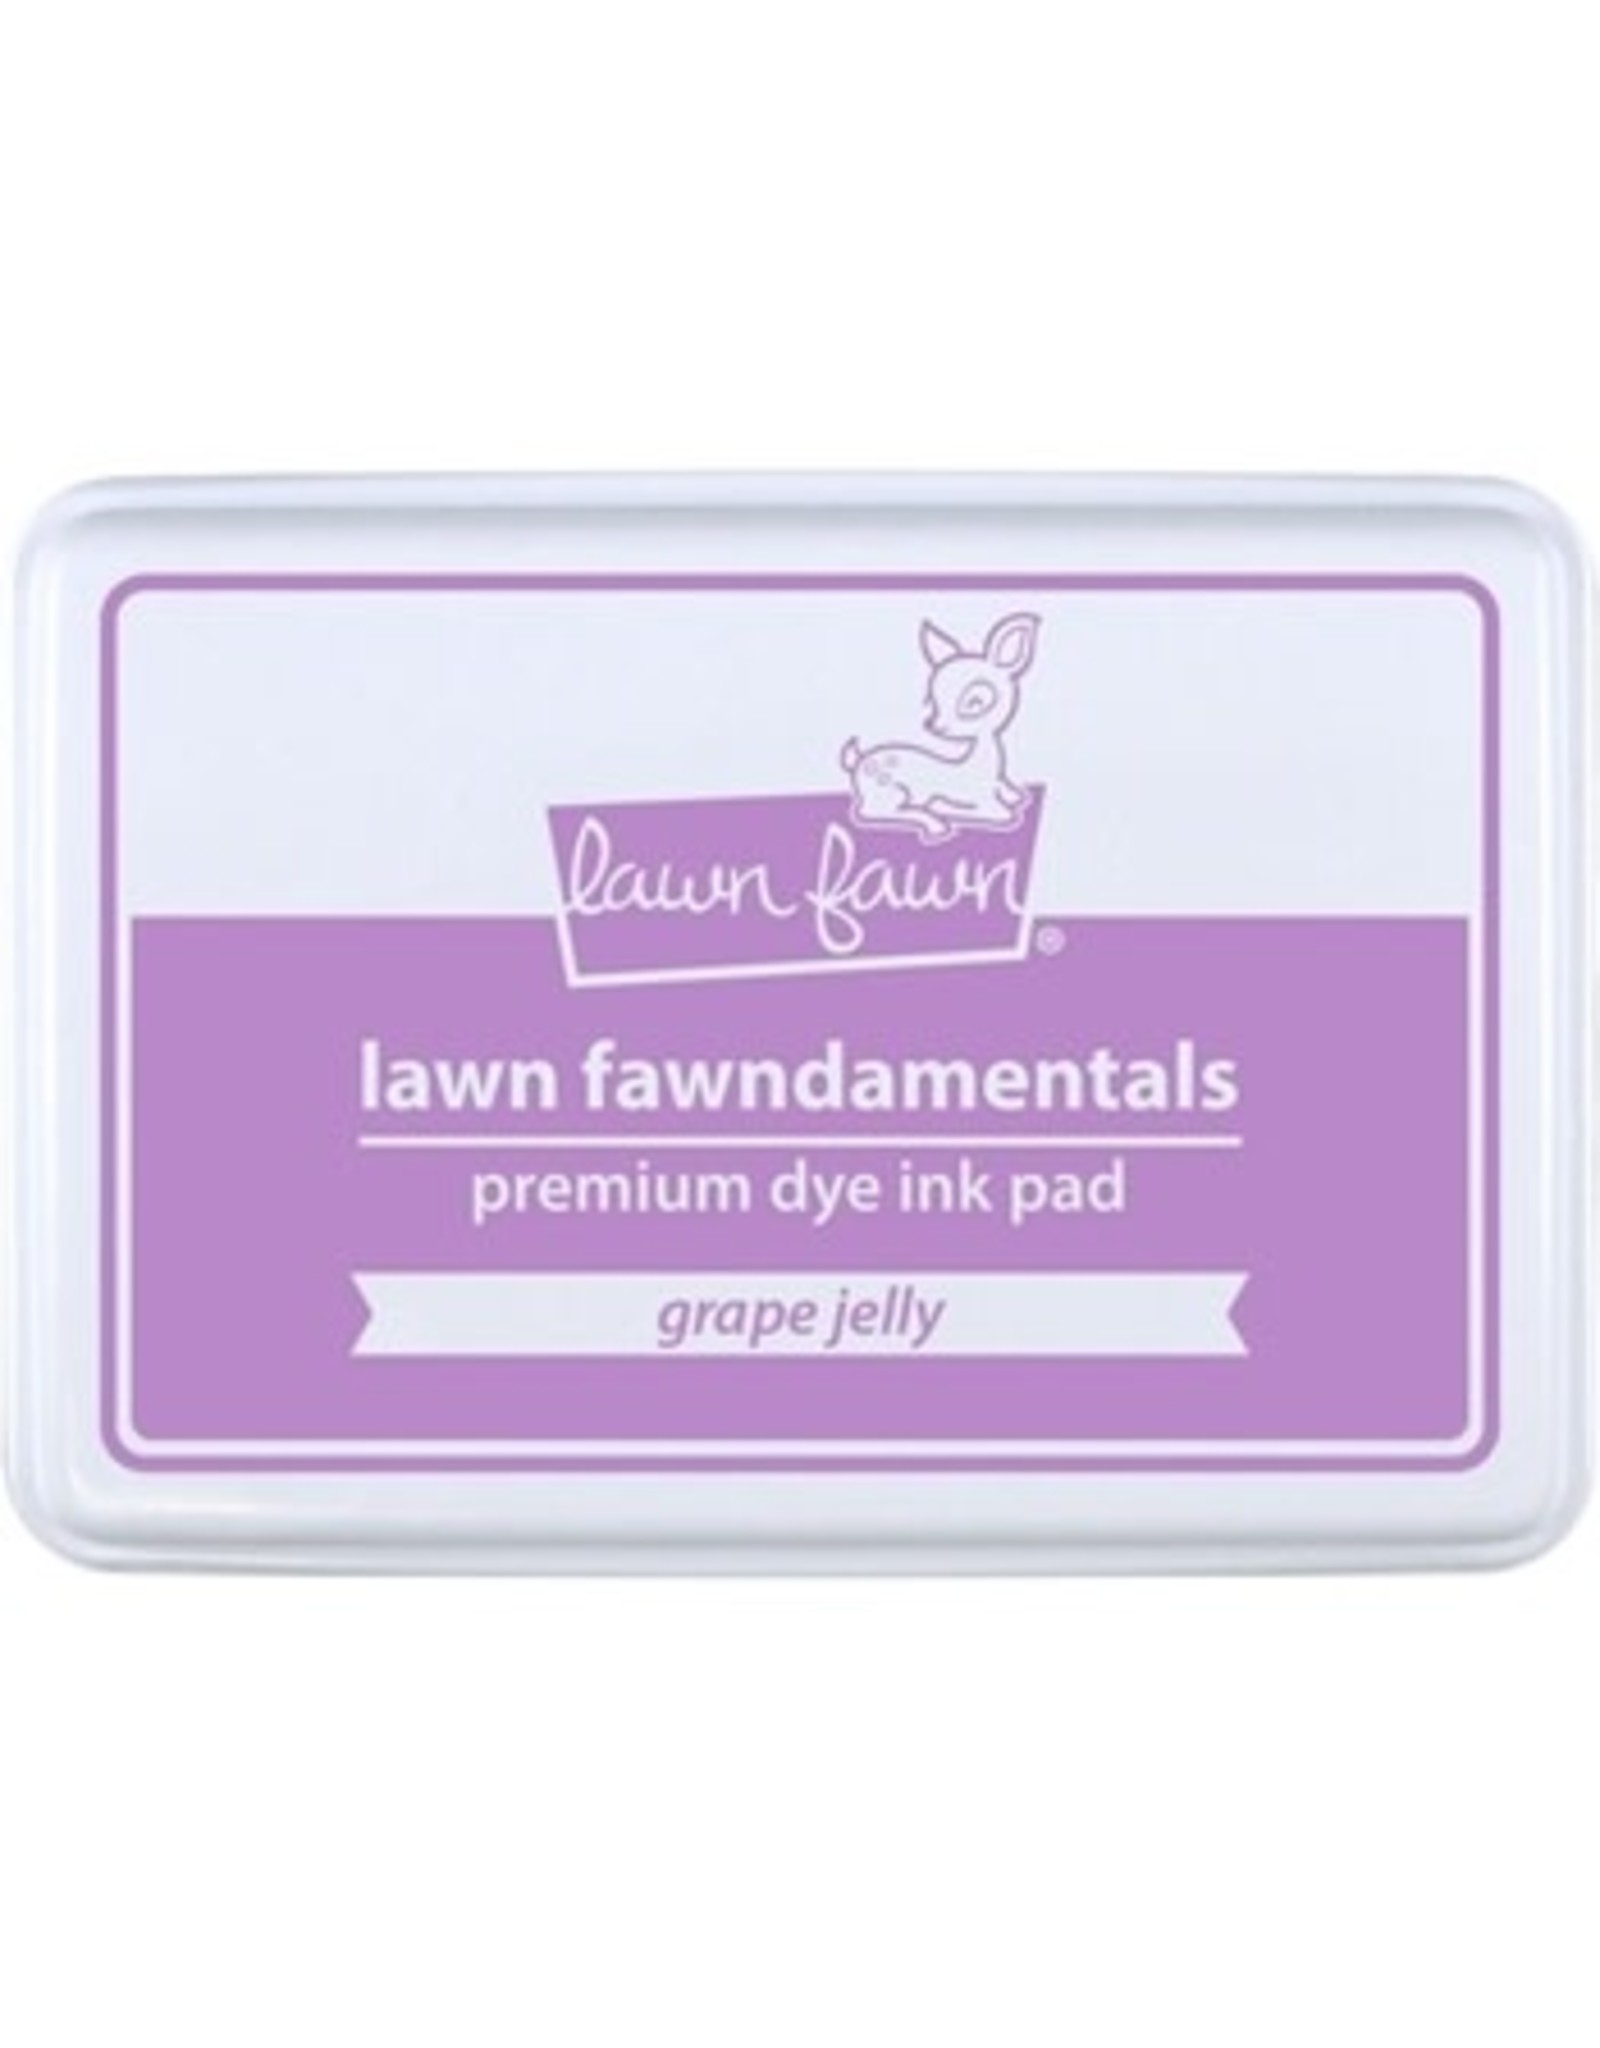 Lawn Fawn Lawn Fawndamentals Dye Ink Pad - Grape Jelly